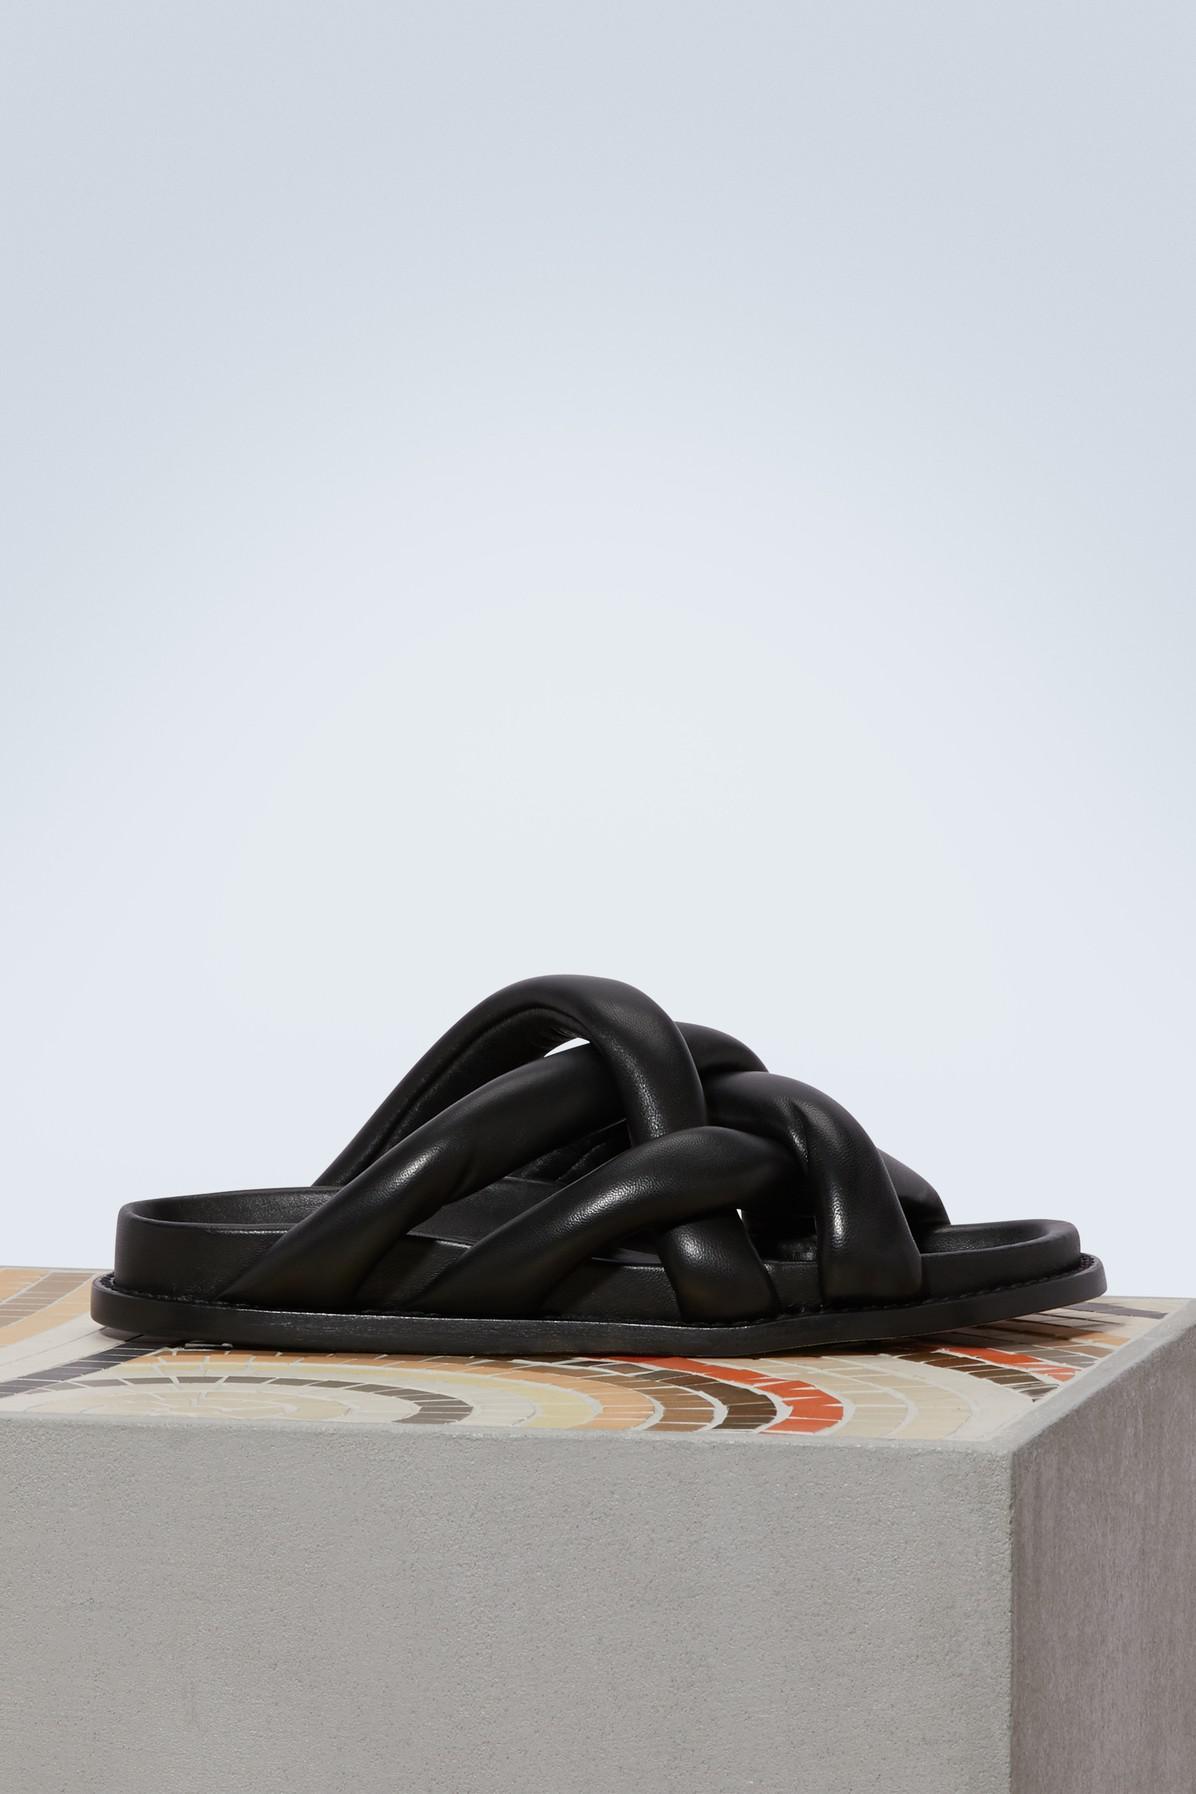 Proenza Schouler Traced leather mules